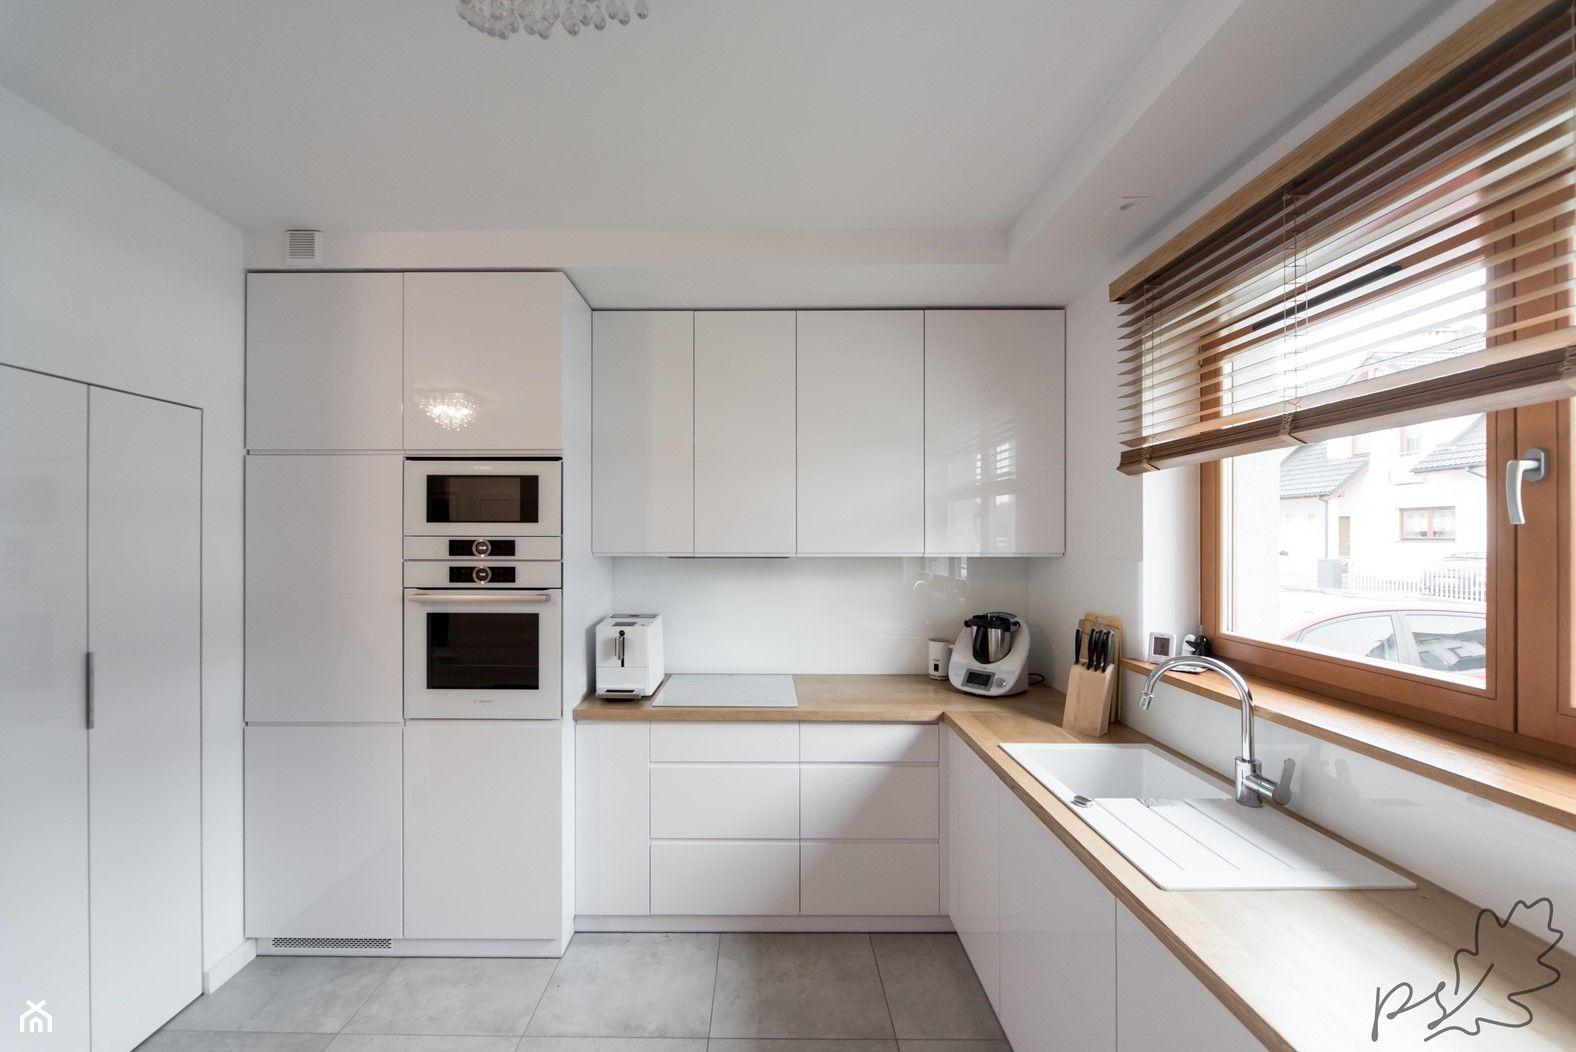 Pin By Jadwiga Smoluch On Kacik Kitchen Cabinet Design Kitchen Design Small Kitchen Interior